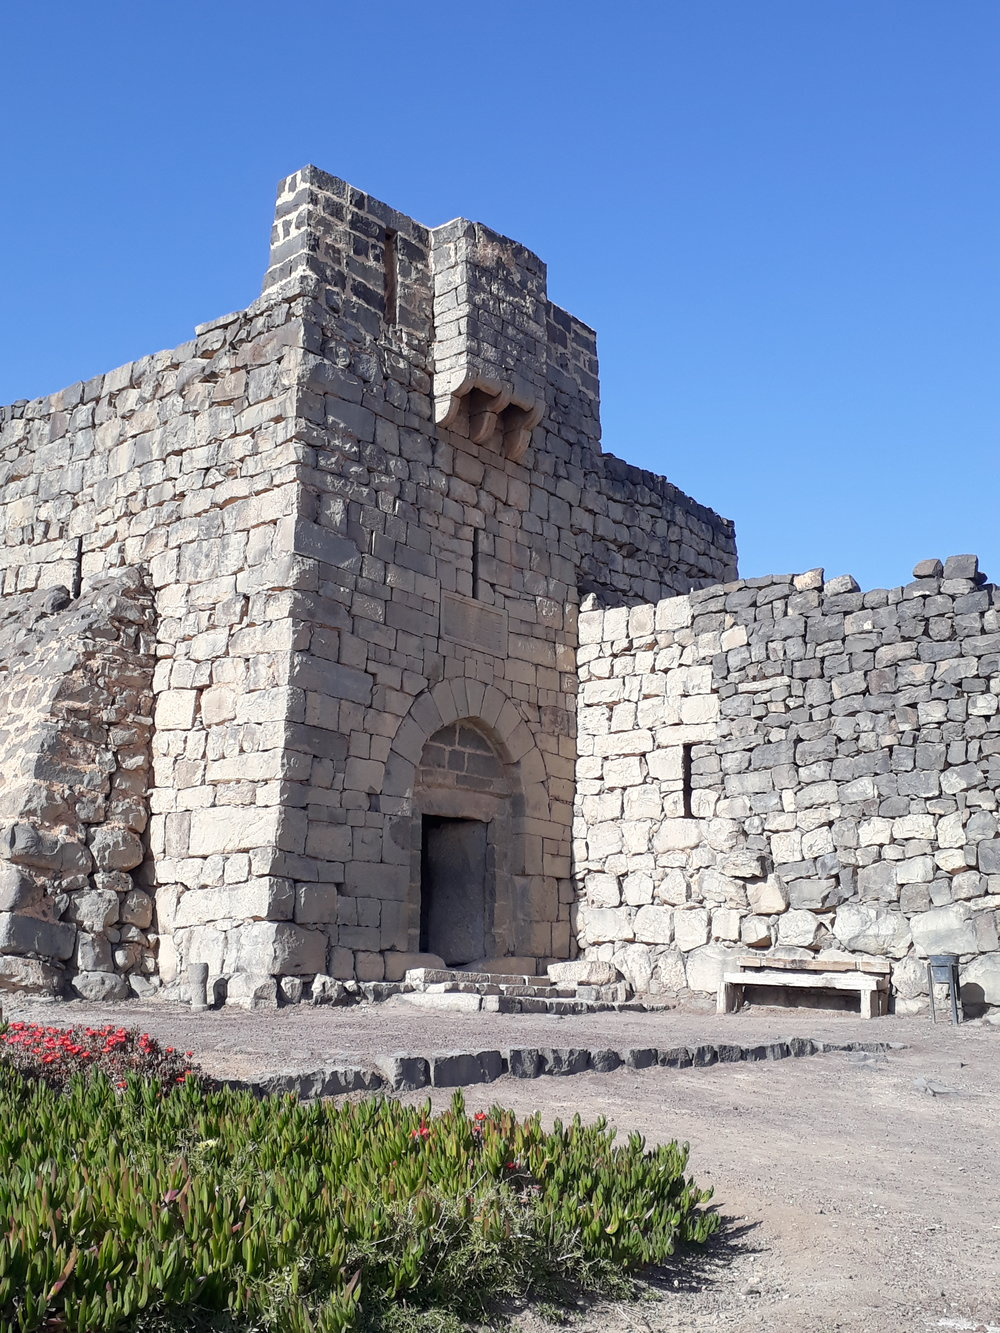 Entrance to Azraq Castle Jordan